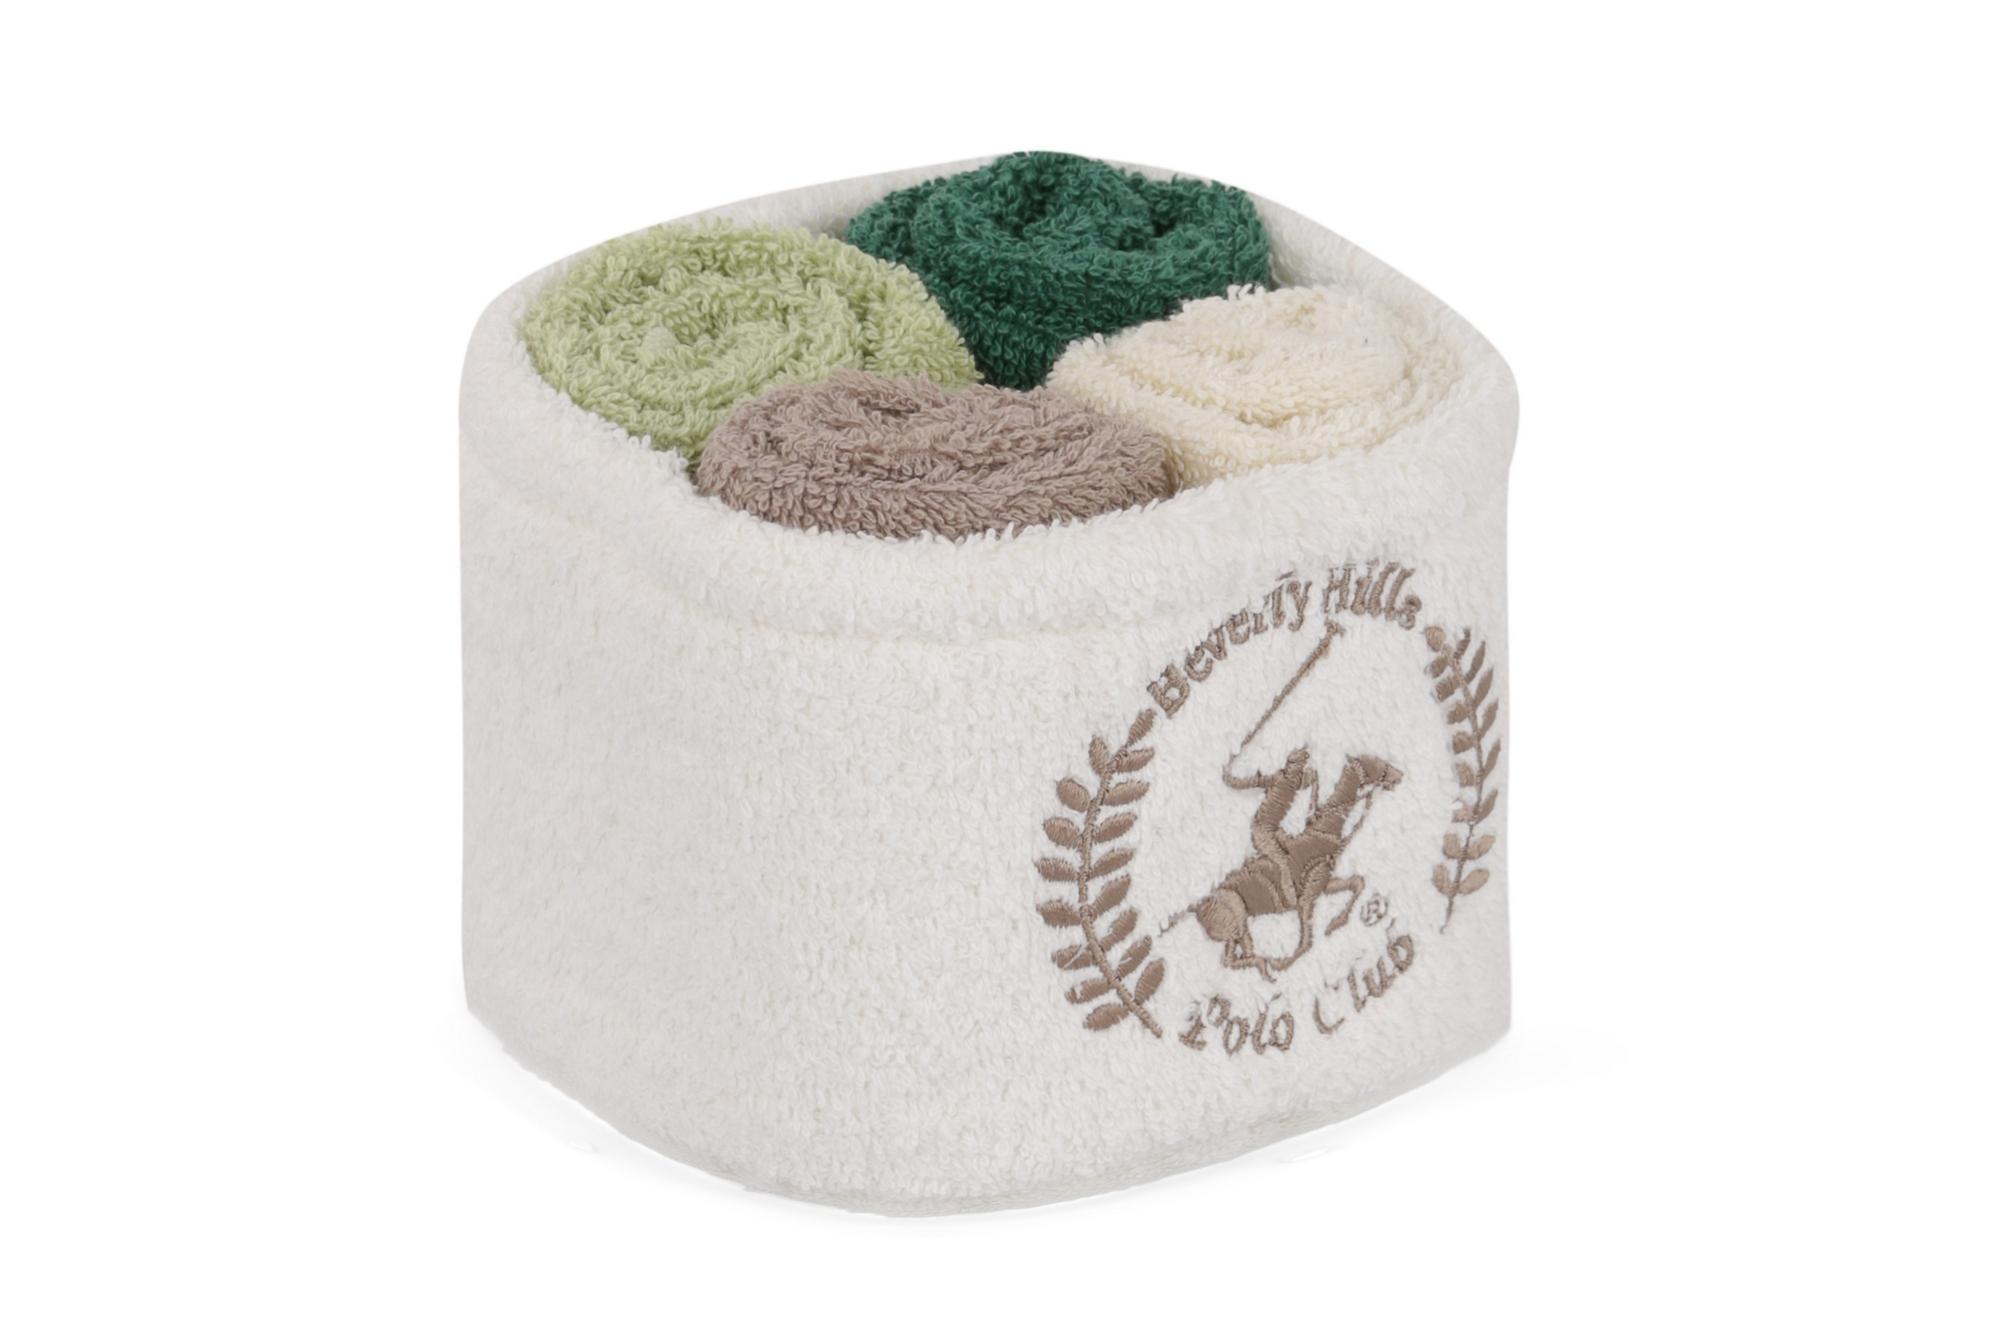 Set 4 prosoape baie din bumbac, Beverly Hills Polo Club Alinda Alb V10 / Mix 4 culori, 30 x 30 cm imagine